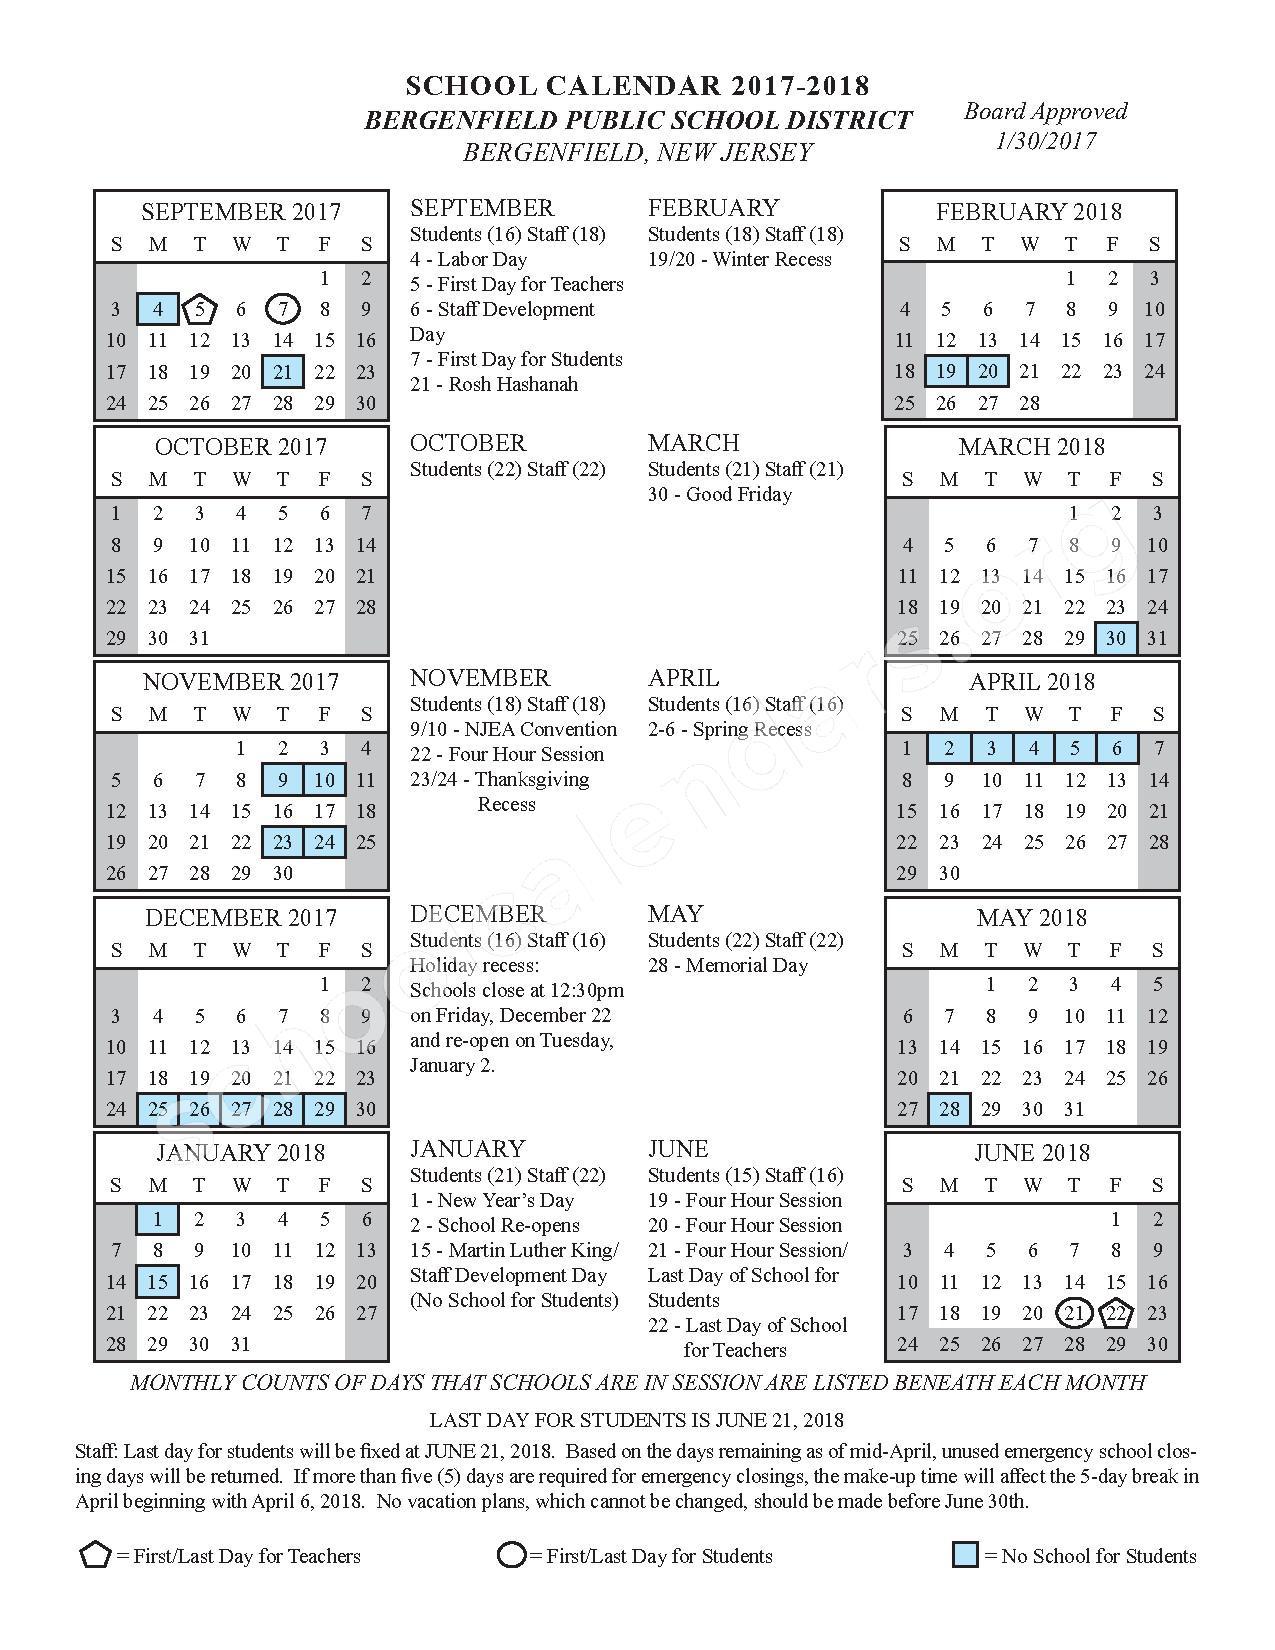 2017 - 2018 District Calendar – Bergenfield Public Schools – page 1